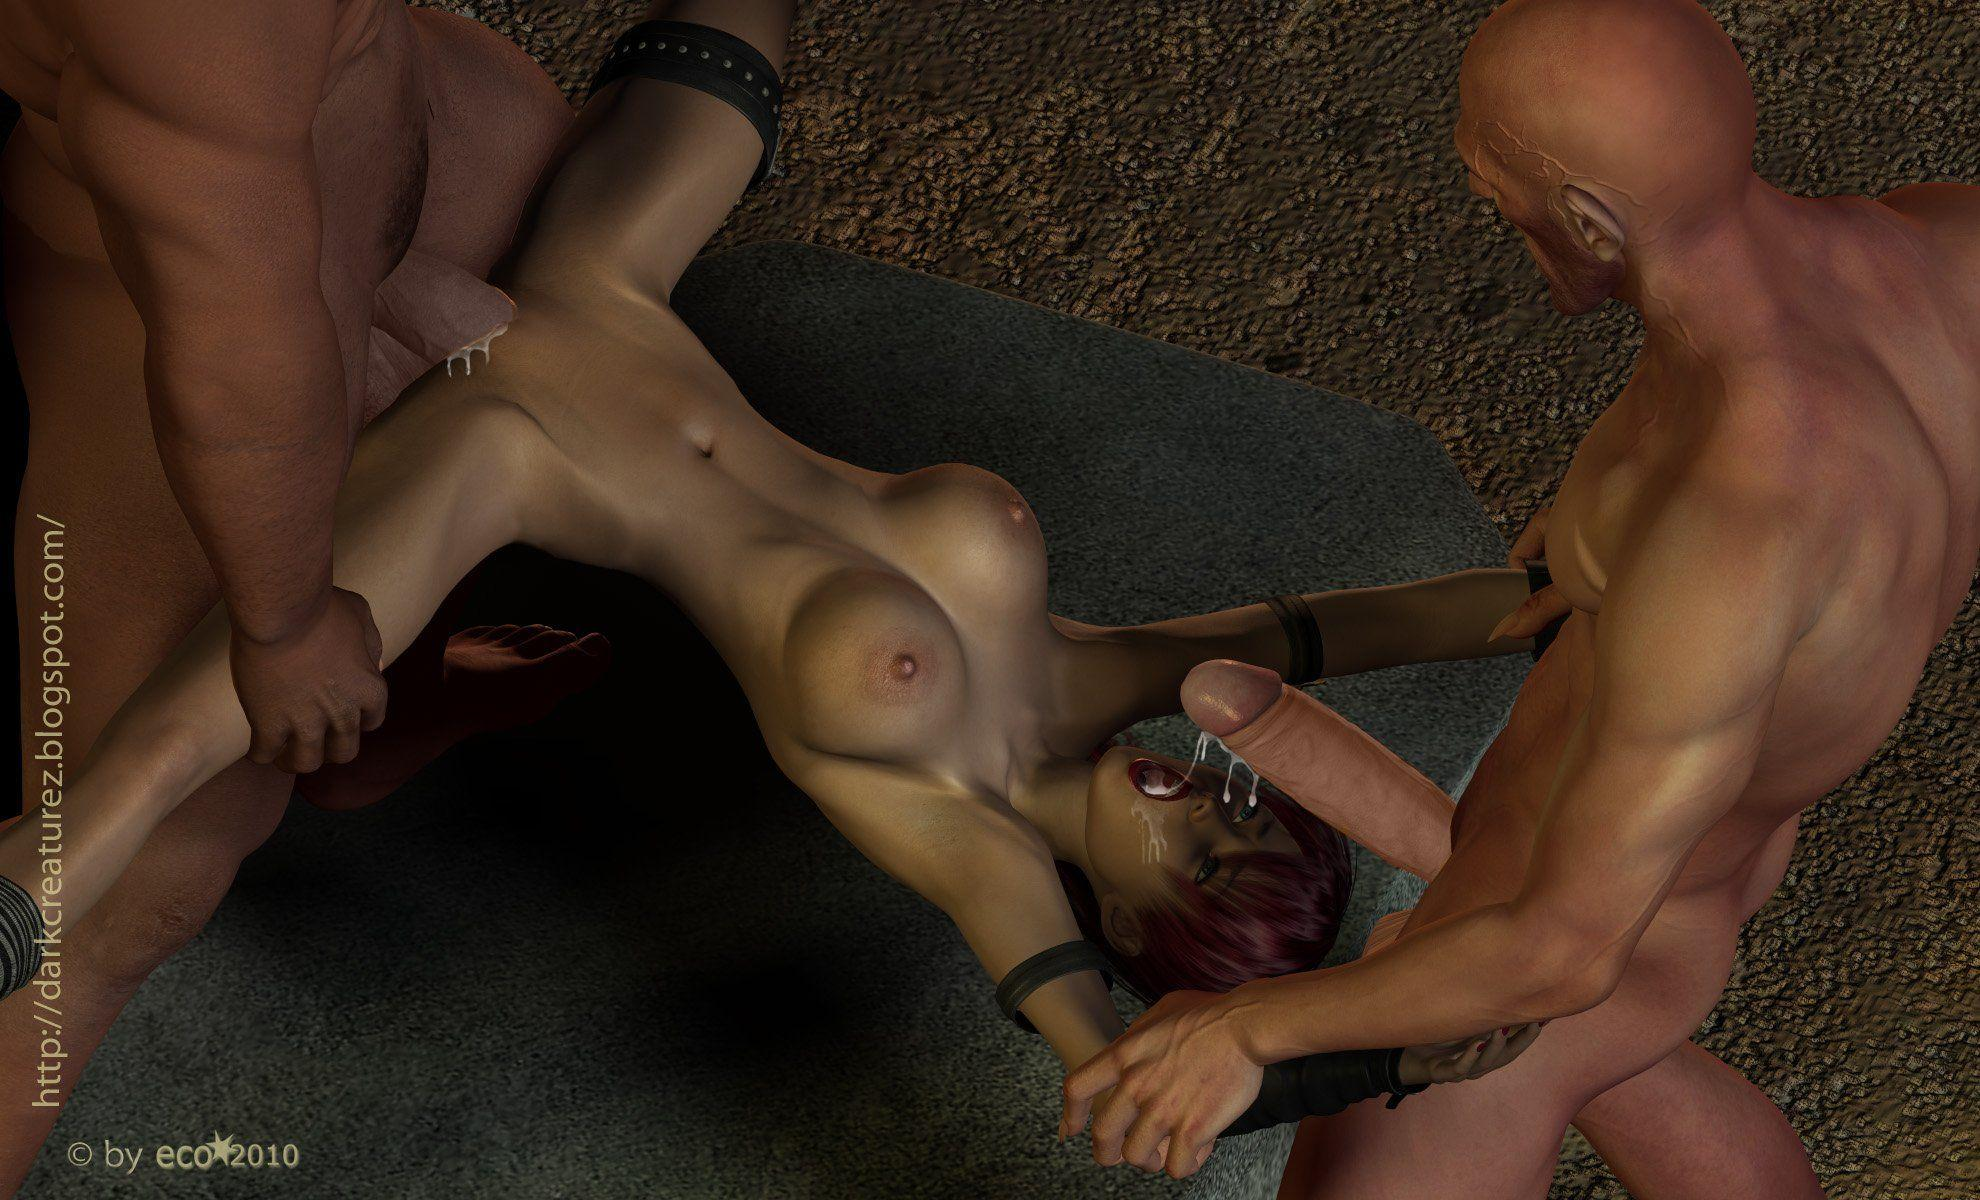 3d hentai movies galleries - porn tube.